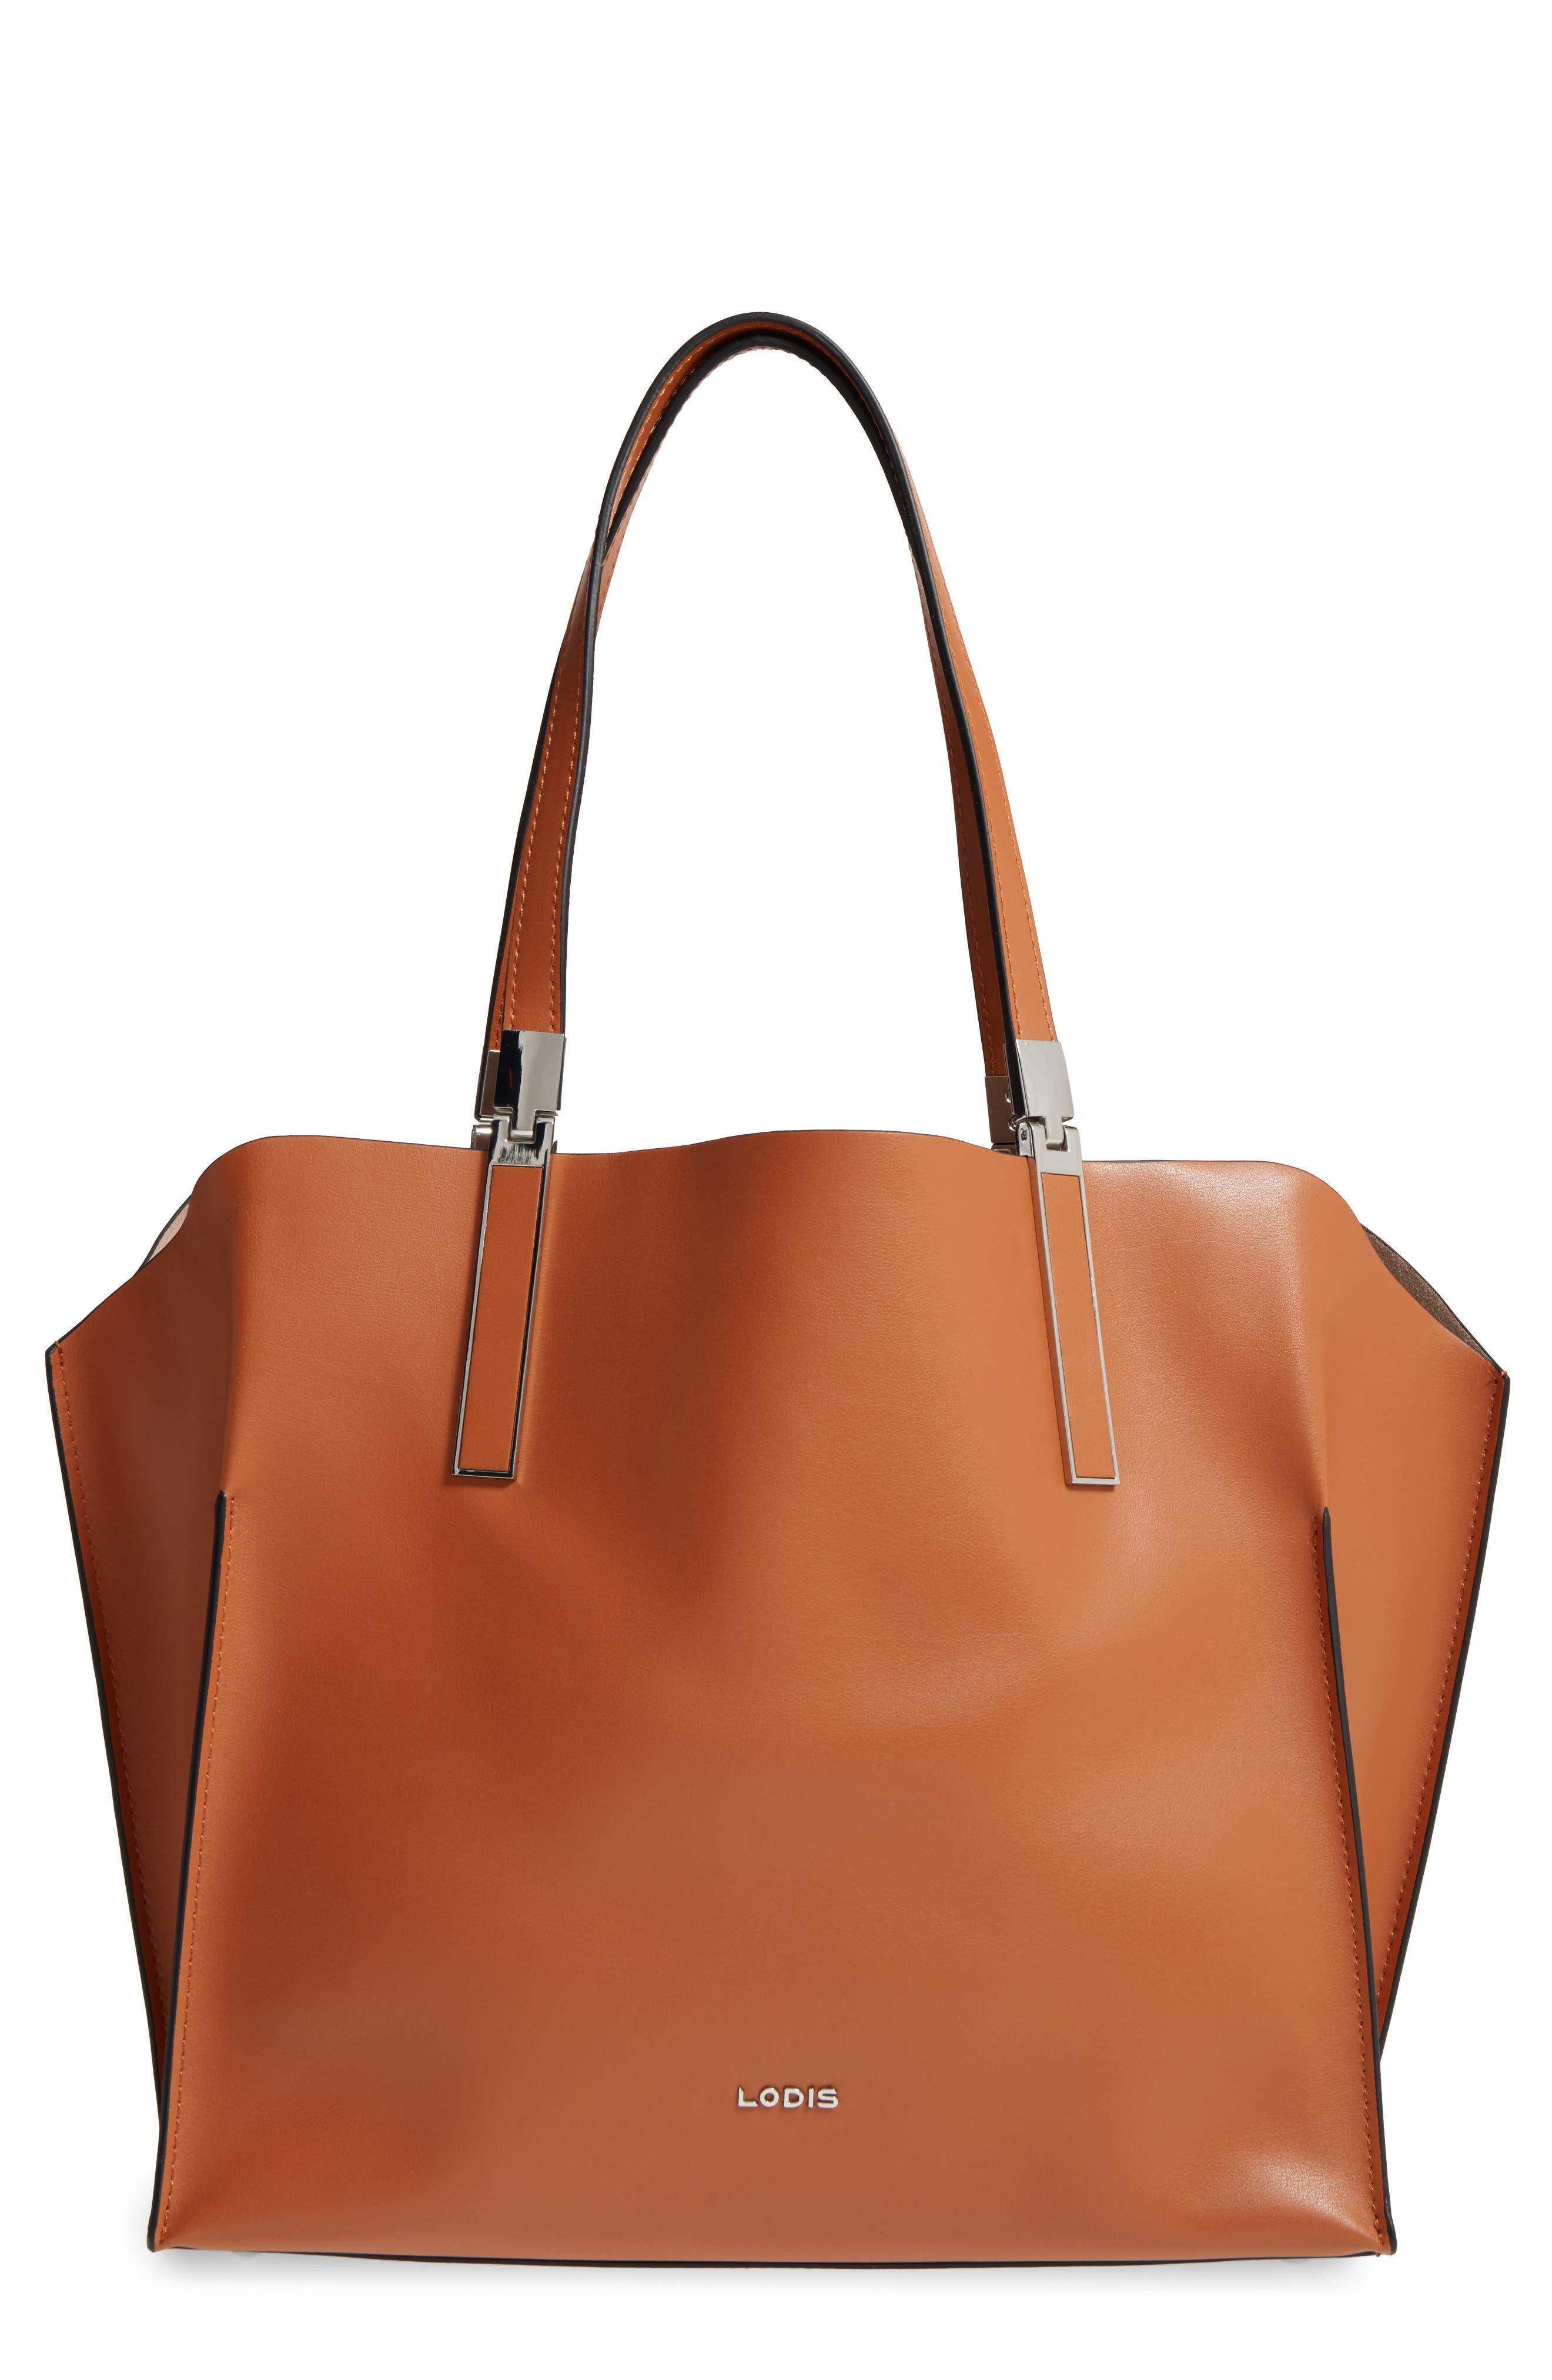 Main Image - Lodis 'Blair Collection - Anita' Leather Tote